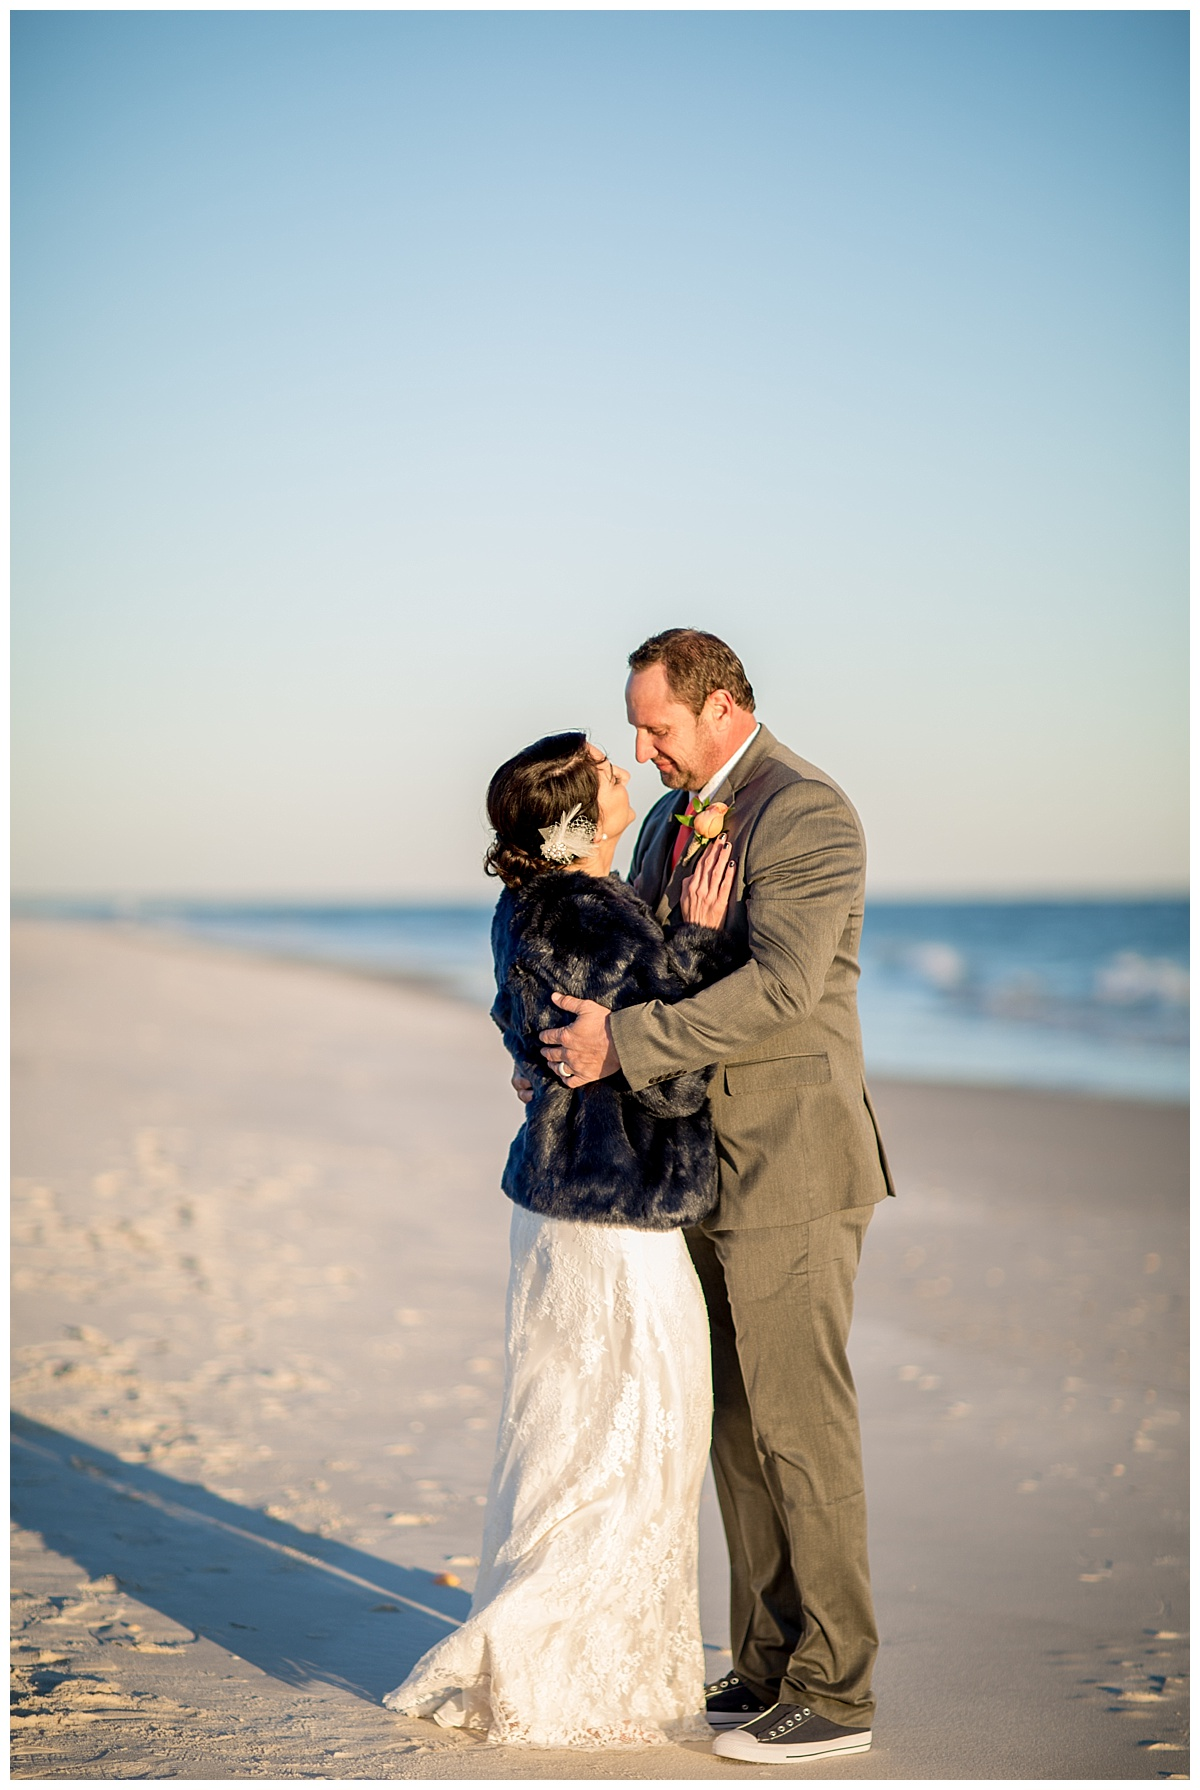 119 Romantic Wedding on the beach .jpg